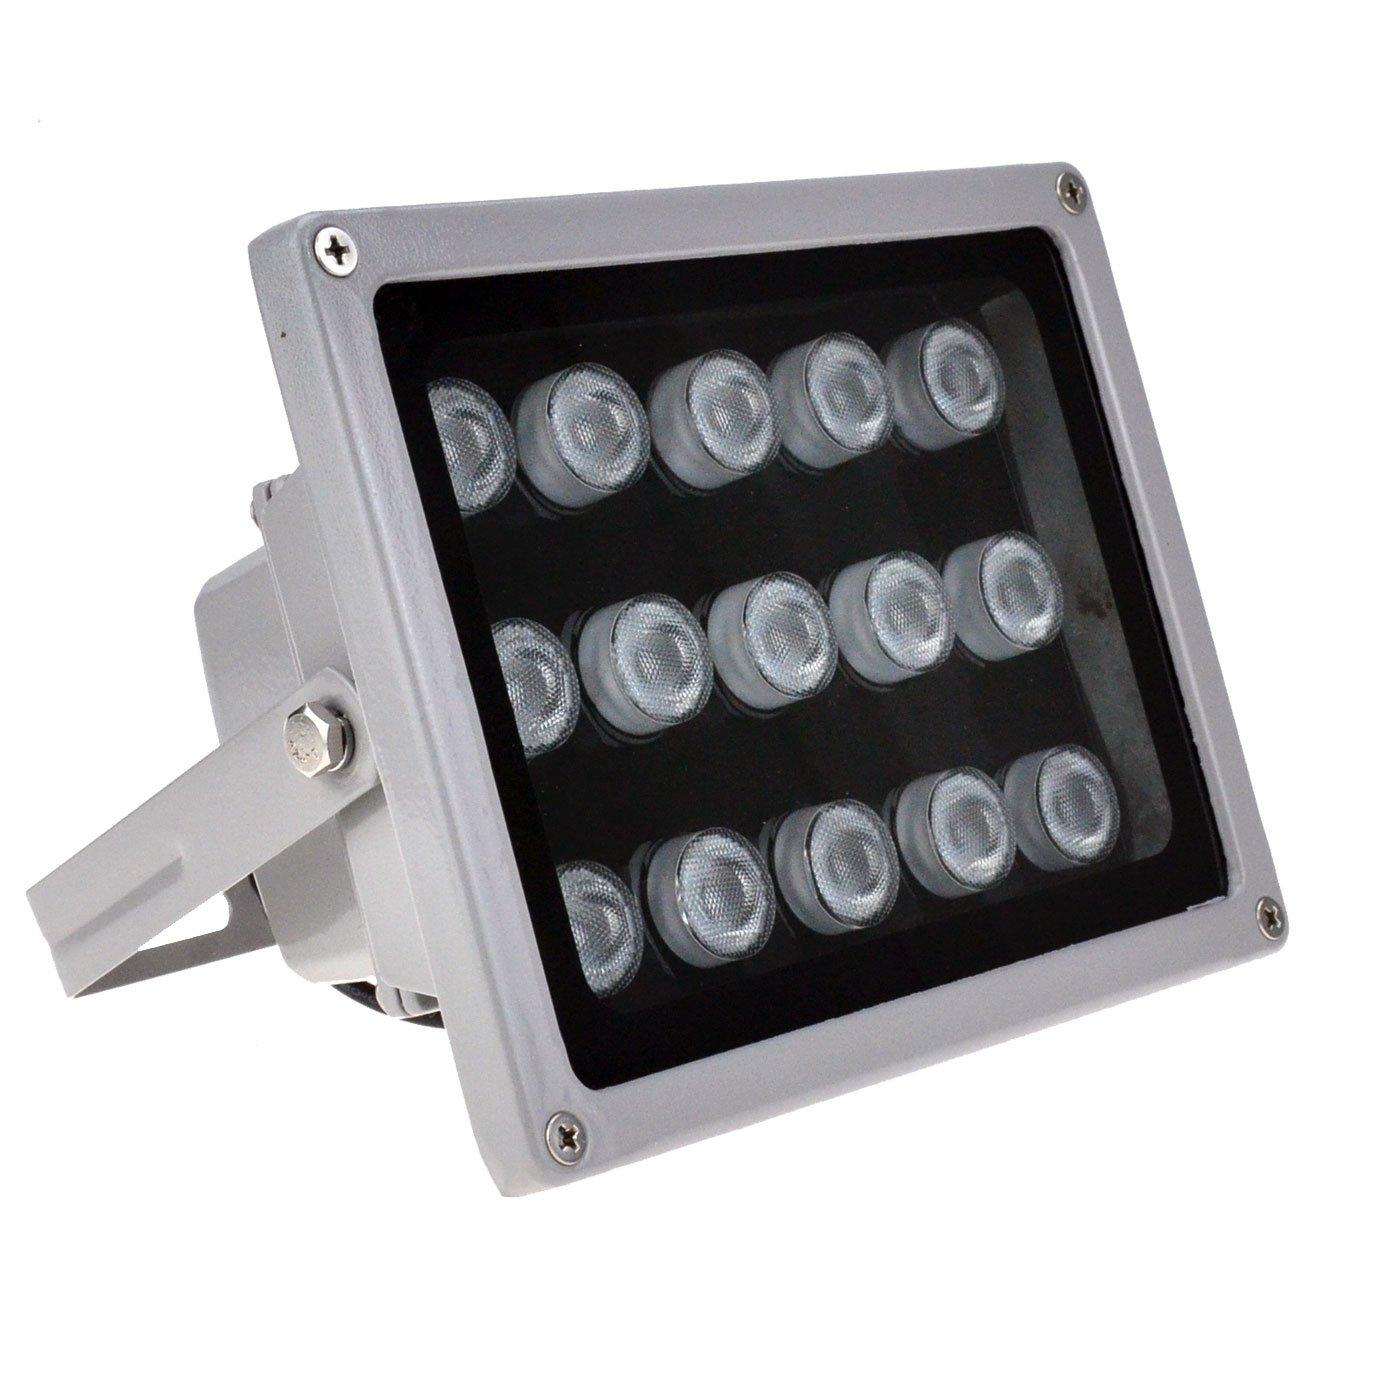 VIKYLIN IR Illuminator 850nm 15 PCS LEDs 90 Degrees Wide Angle IP67 for CCTV Security Camera